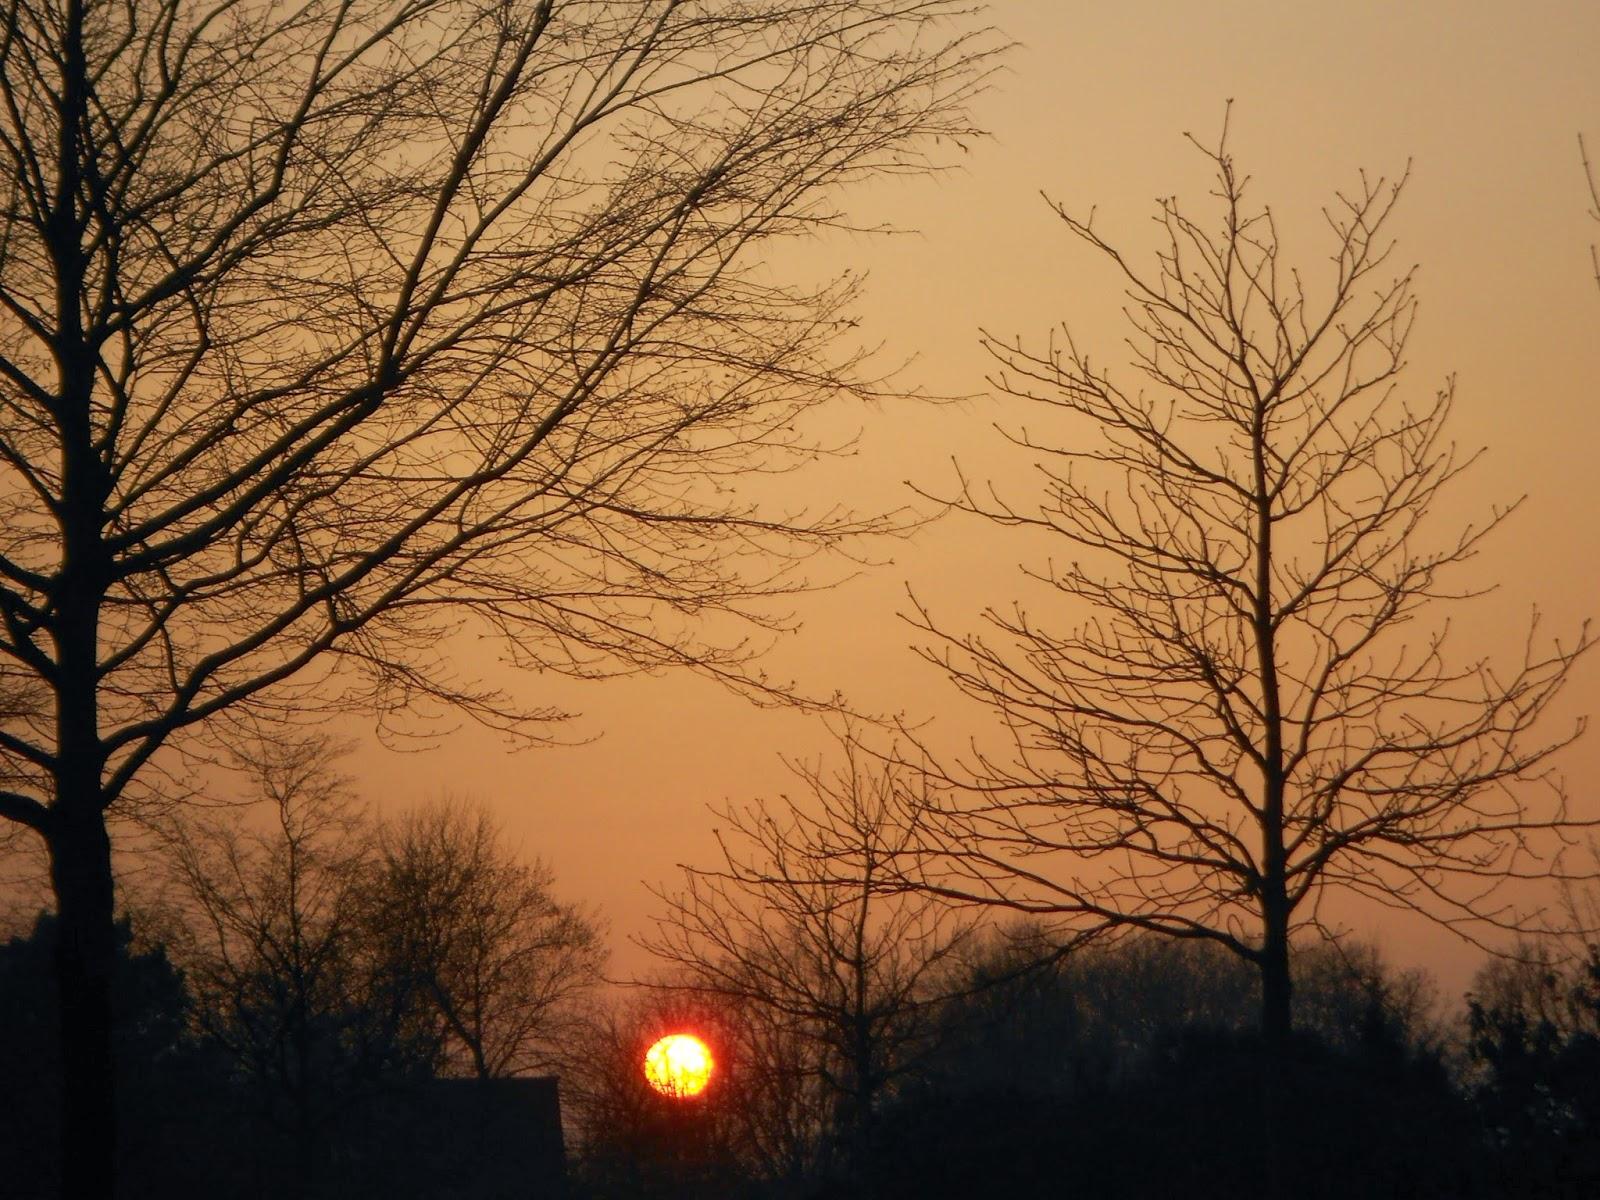 Sonnenuntergang im März